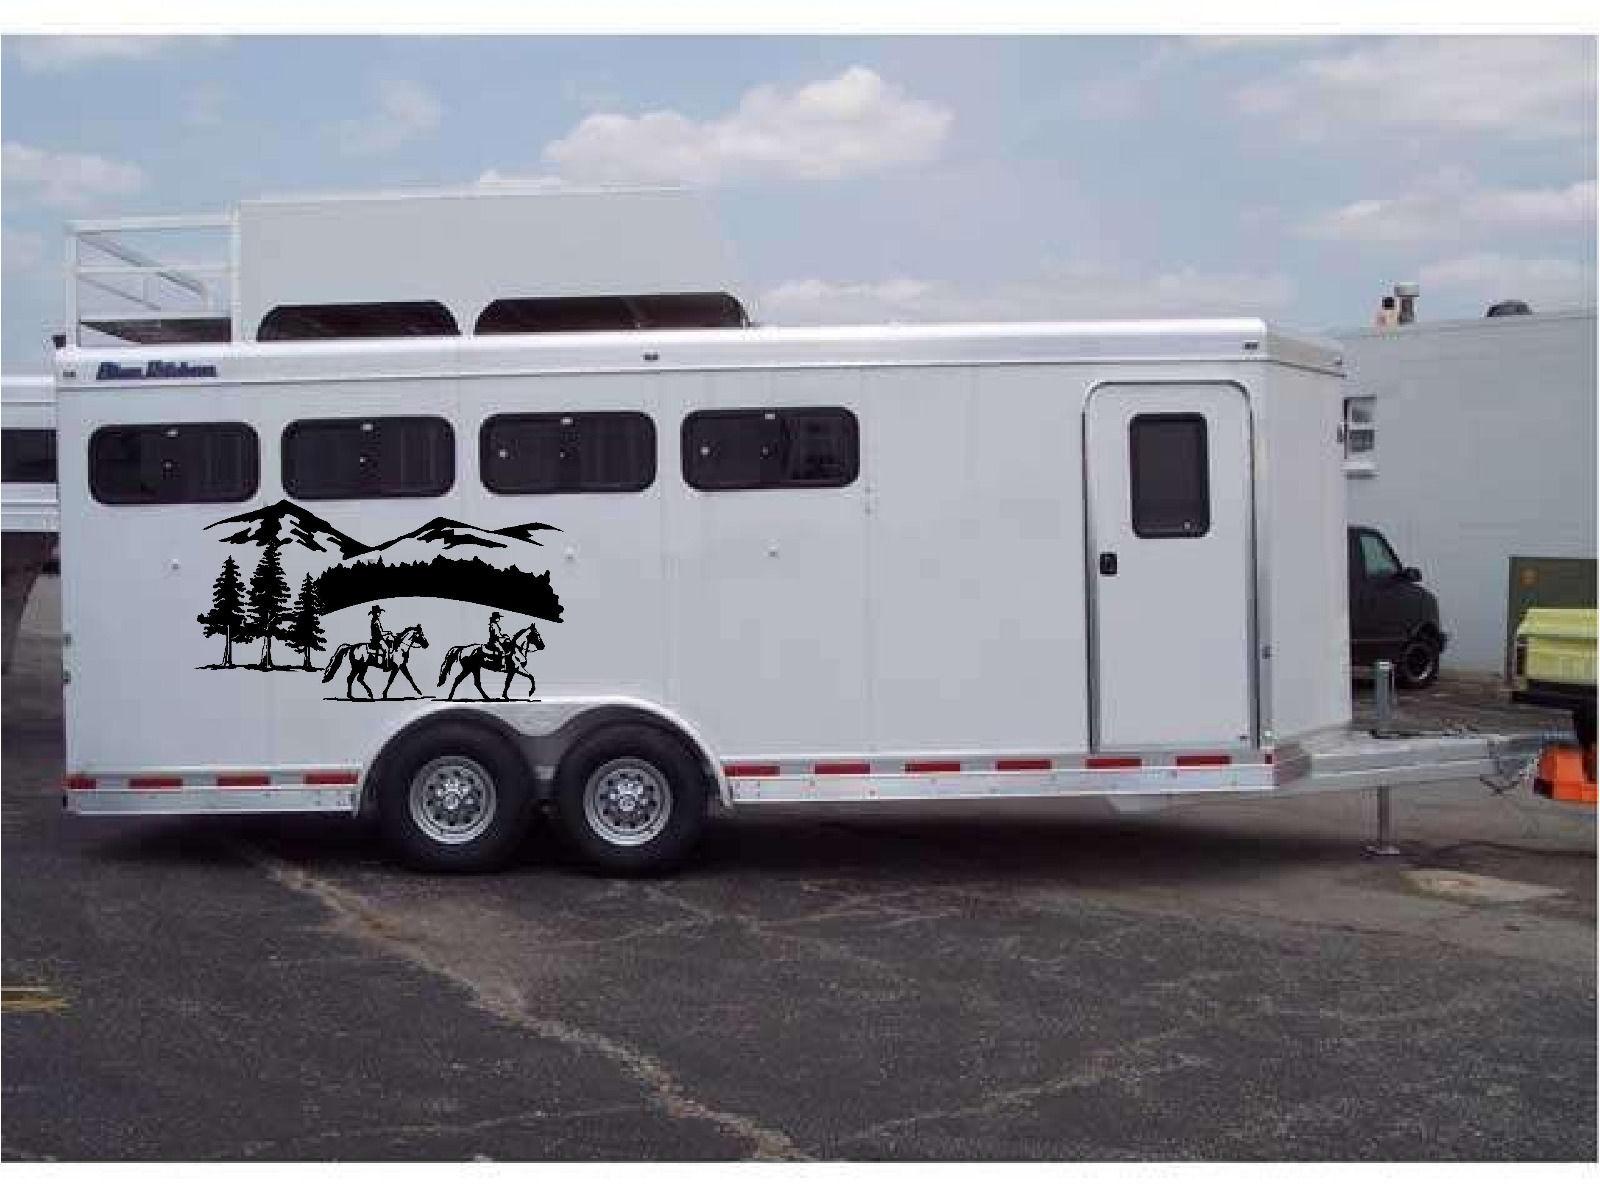 Horses landscape border horse trailer truck rv camper for Decals for rv mural